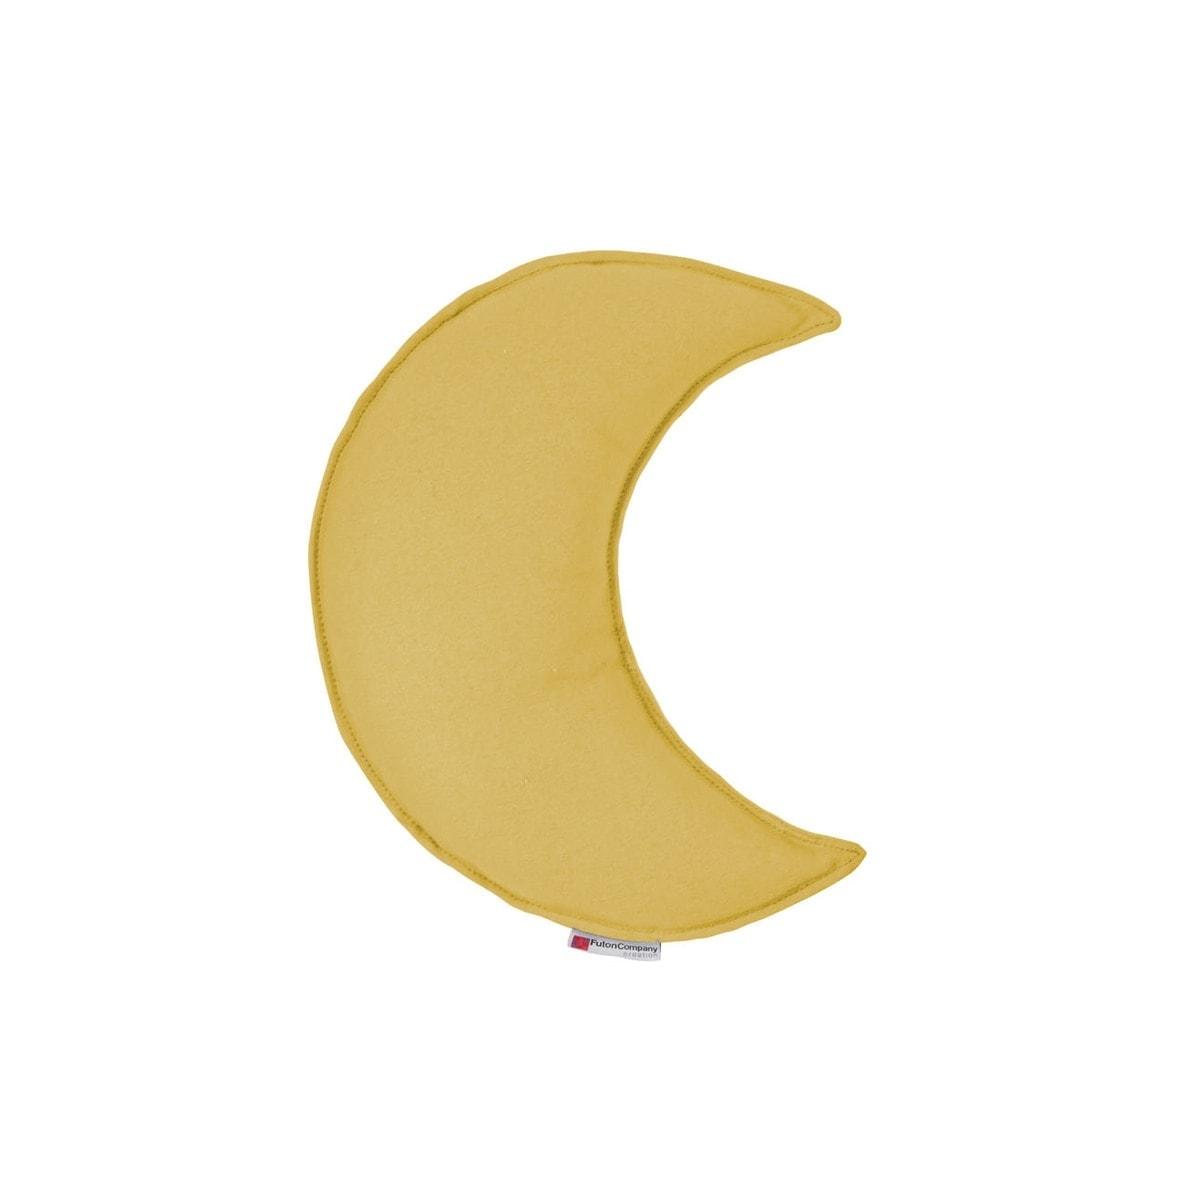 Almofada-Lua-Sharp-P-Tecido-Sarja-Mimosa-01